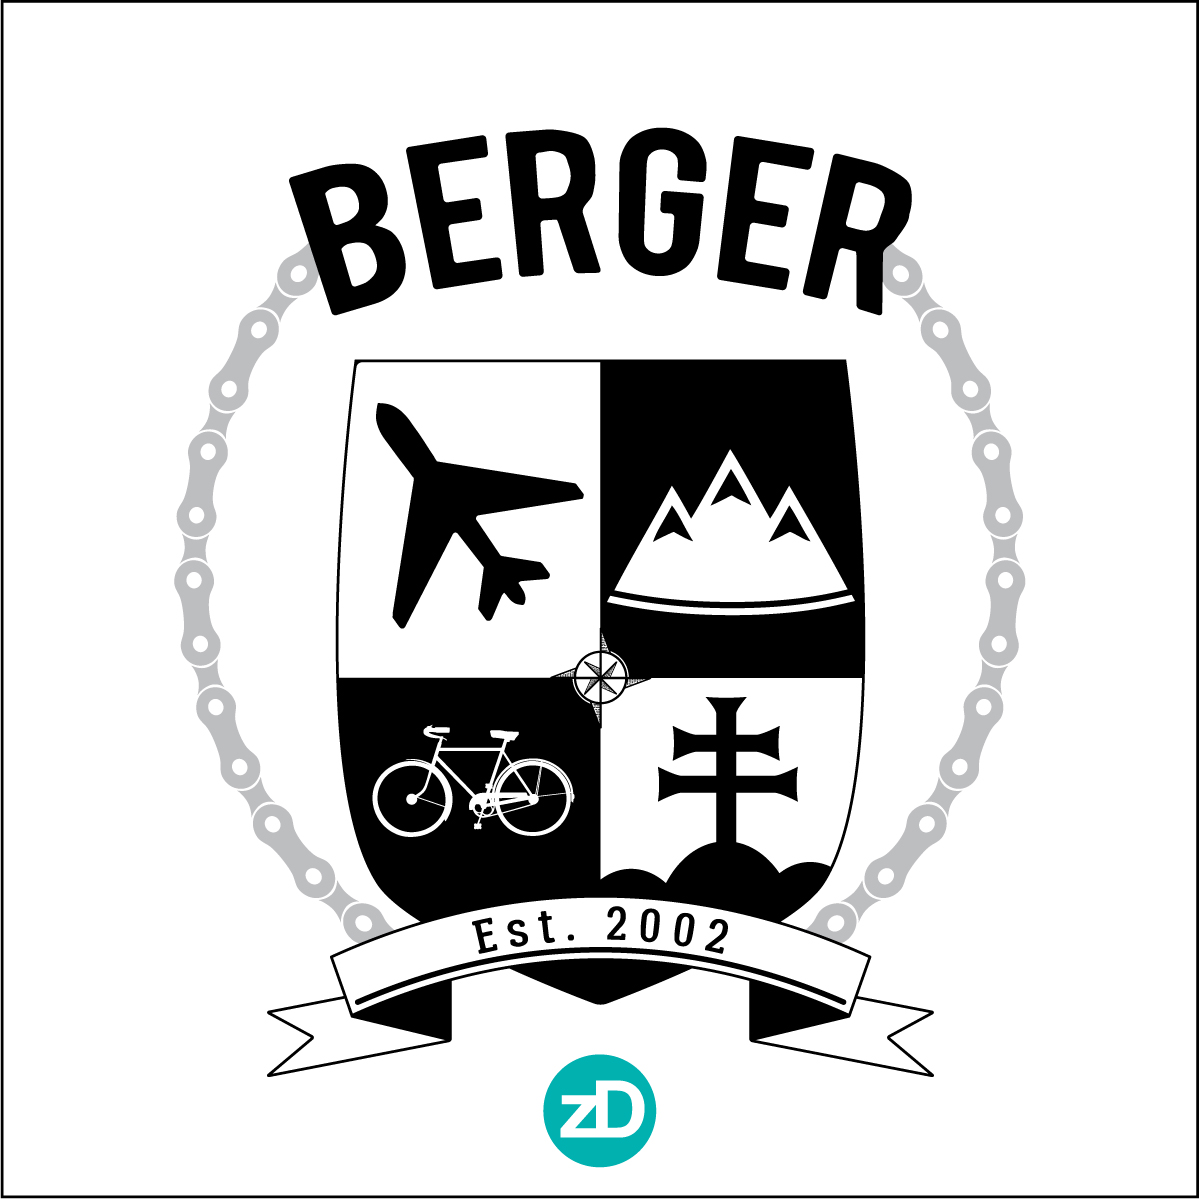 Zirkus Design | Modern Family Crest Design + Inspiration : Base Vector Design